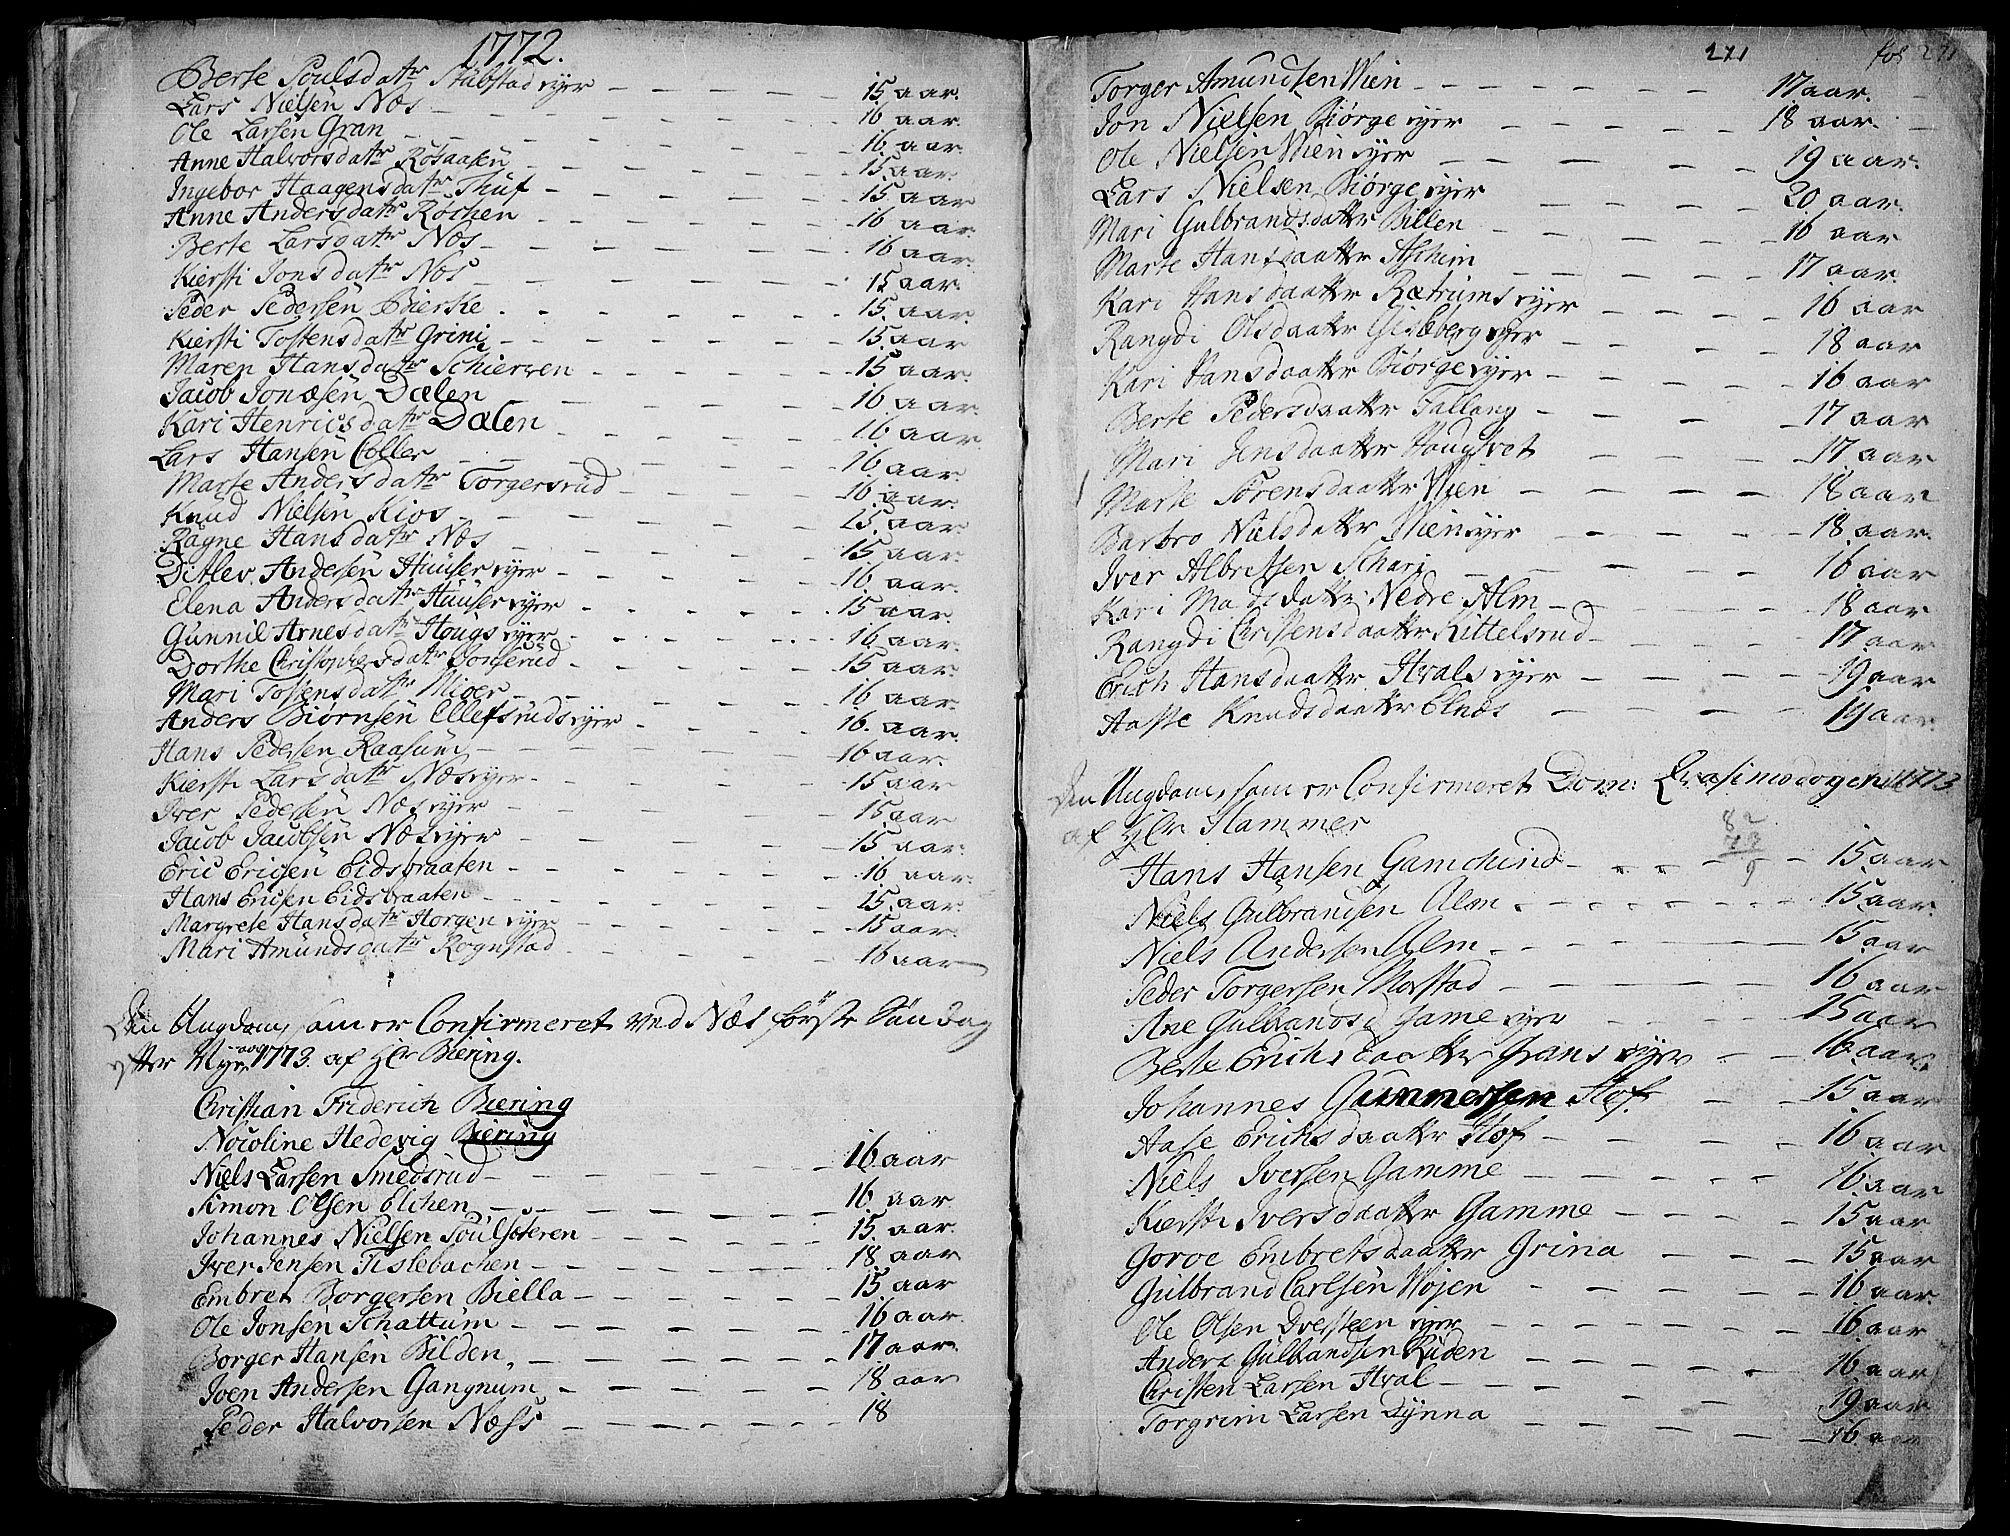 SAH, Gran prestekontor, Ministerialbok nr. 4, 1759-1775, s. 271